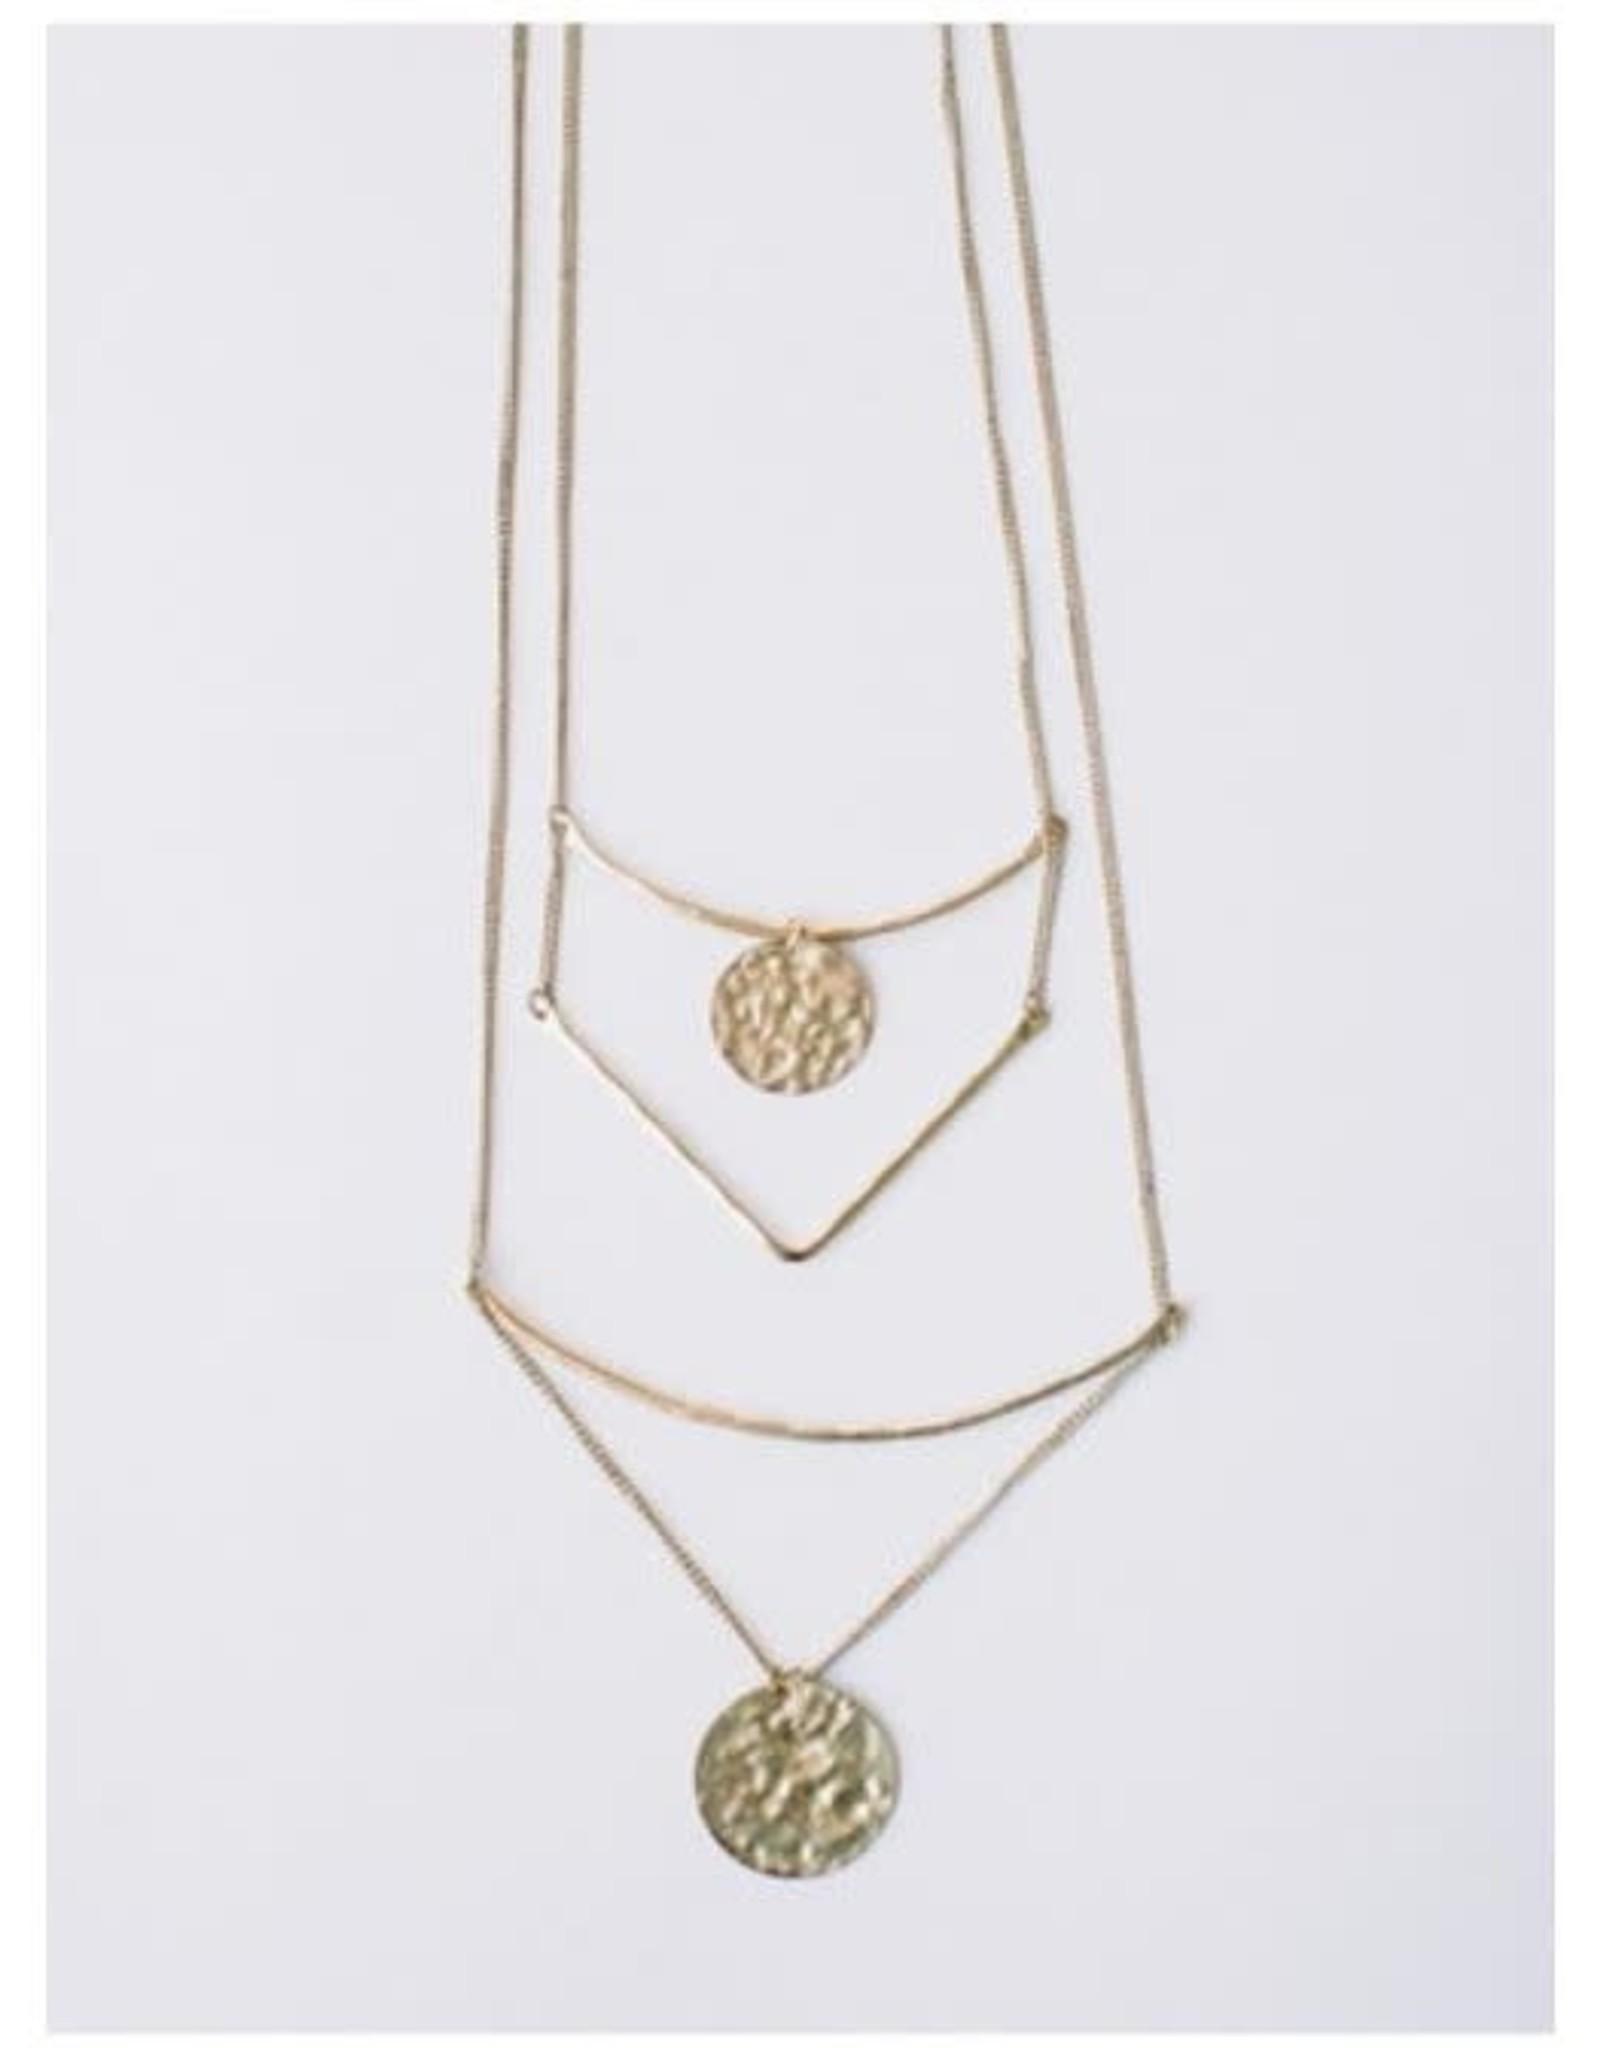 Tiered Sun Drop Necklace, India